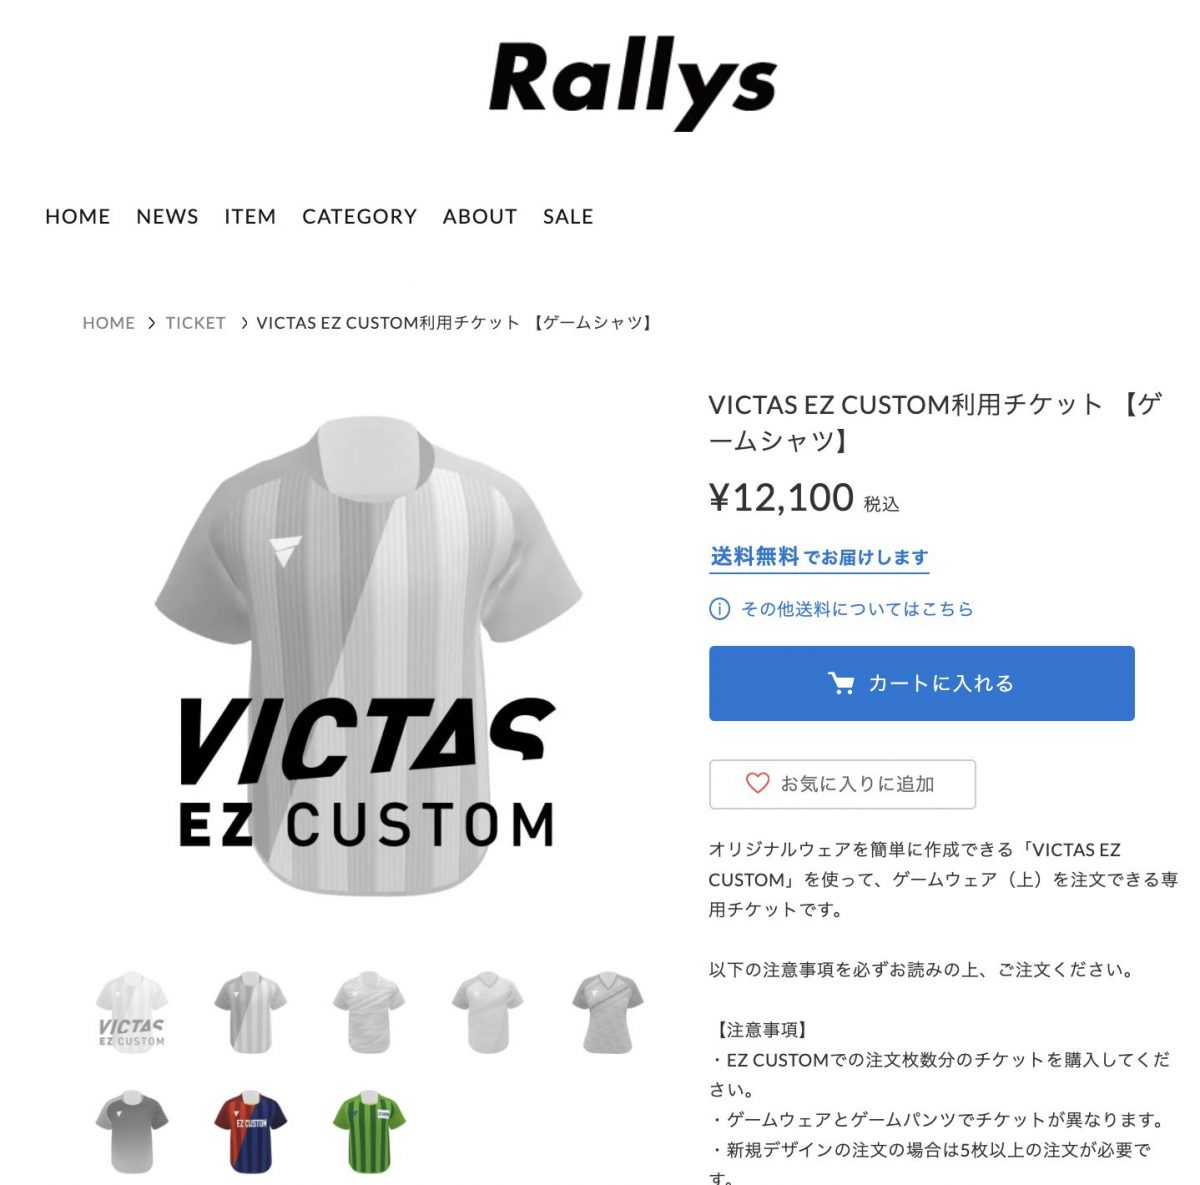 Rallys,EZ CUSTOM,VICTAS